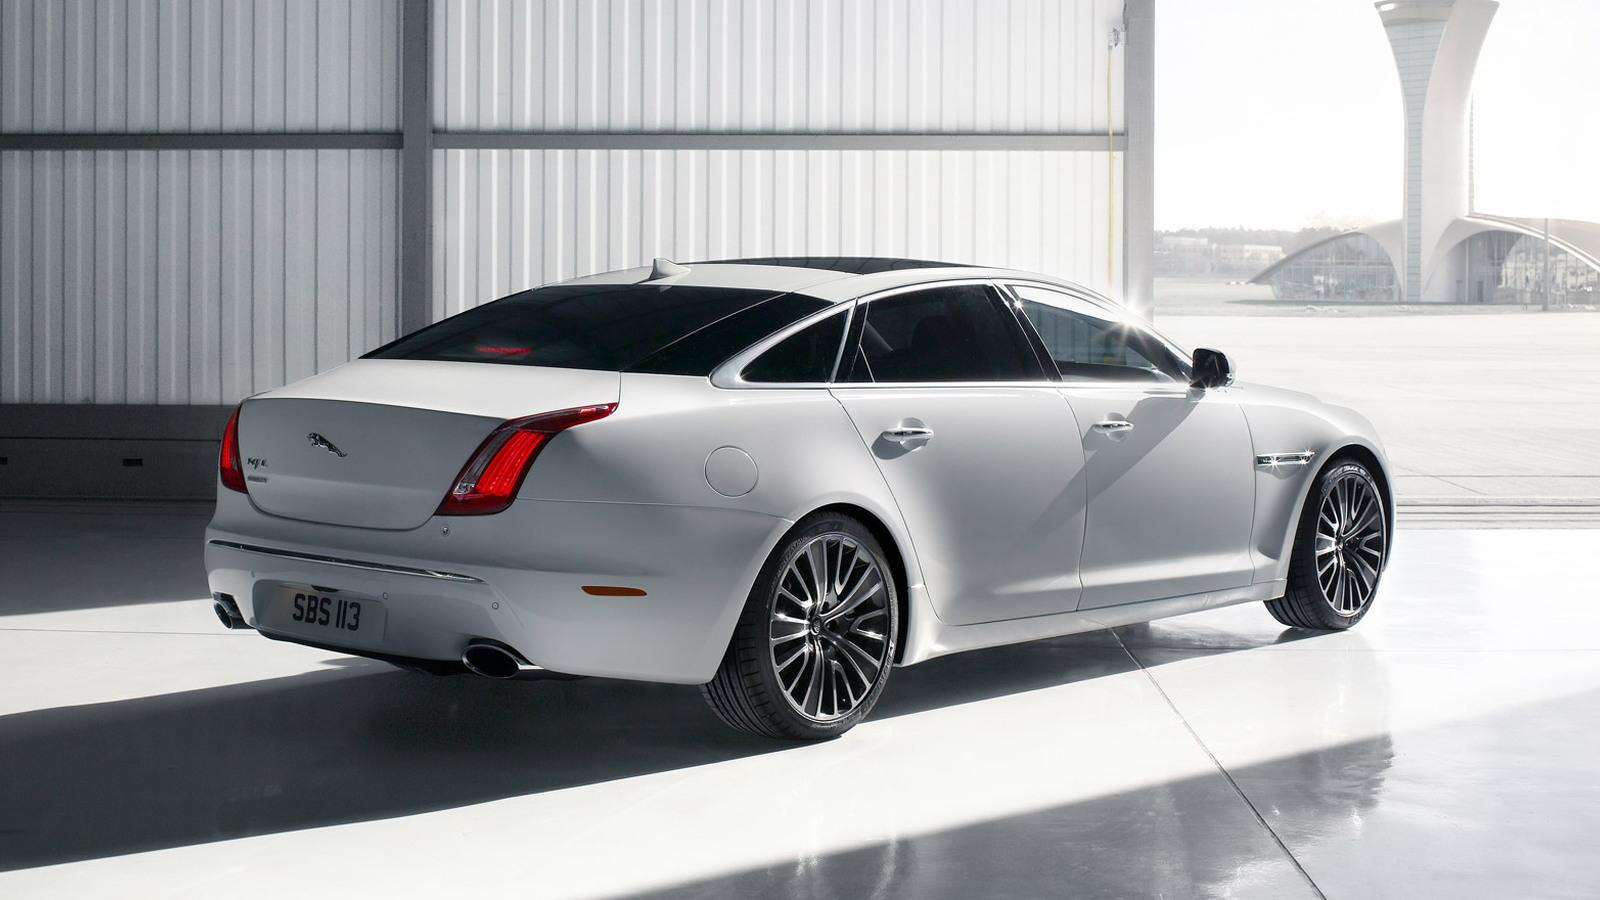 2012 Jaguar XJ Ultimate Edition